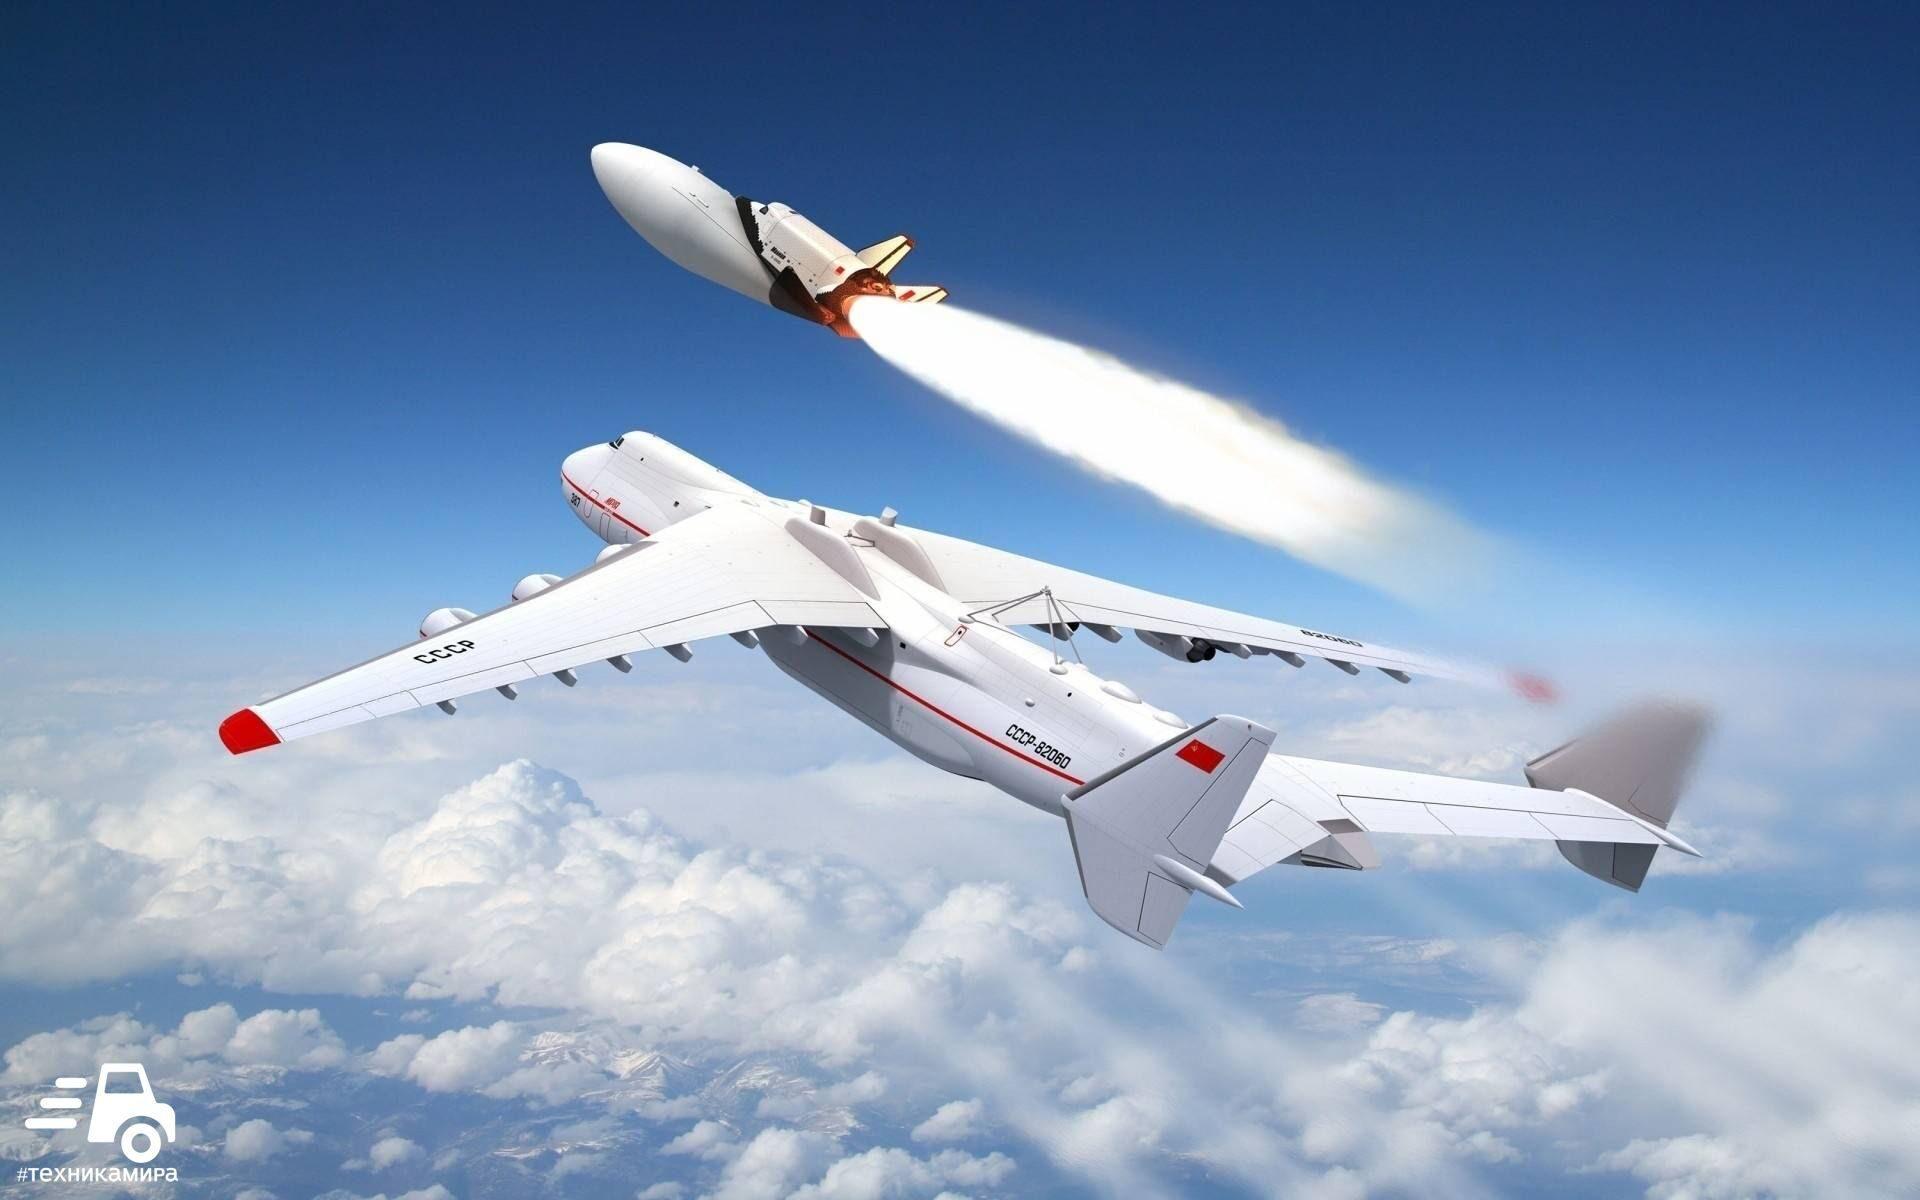 Обои Самолёт, советский, Вм-т, атлант. Авиация foto 19